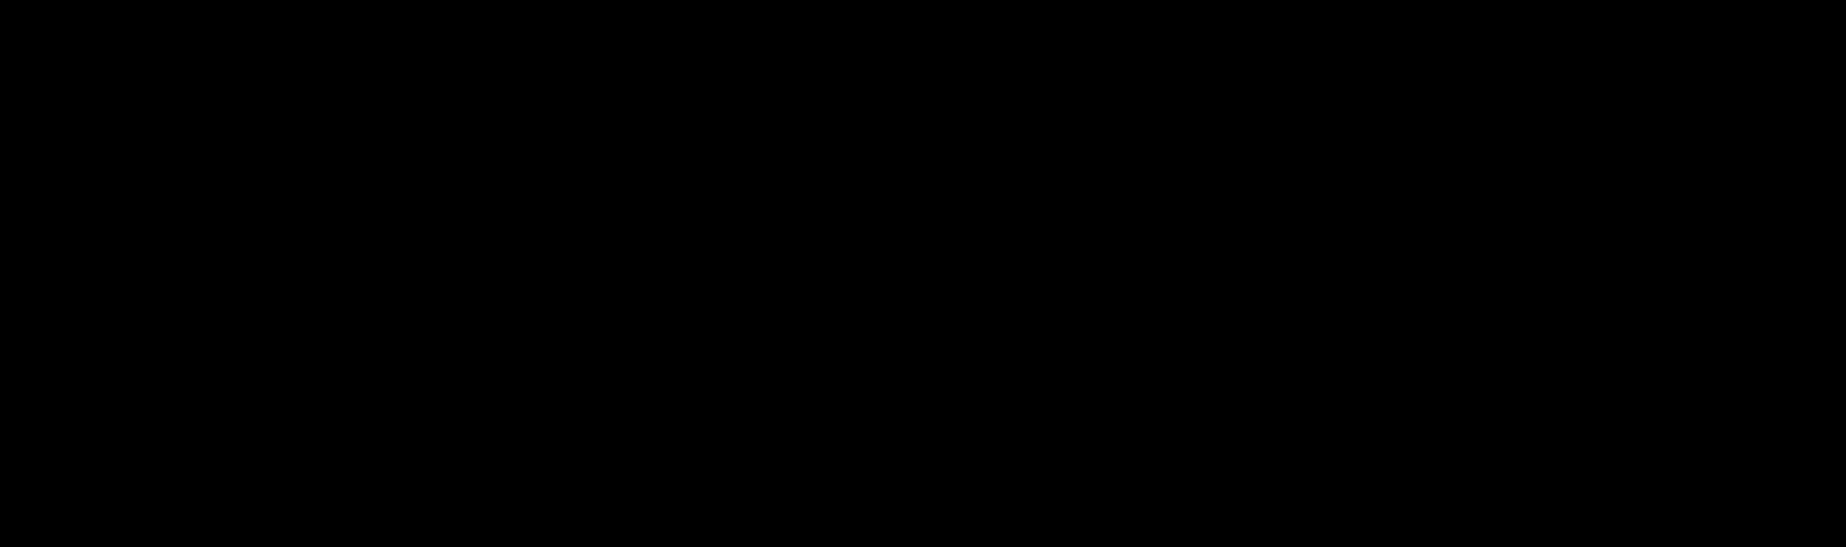 (±)-Atenolol-d<sub>7</sub>